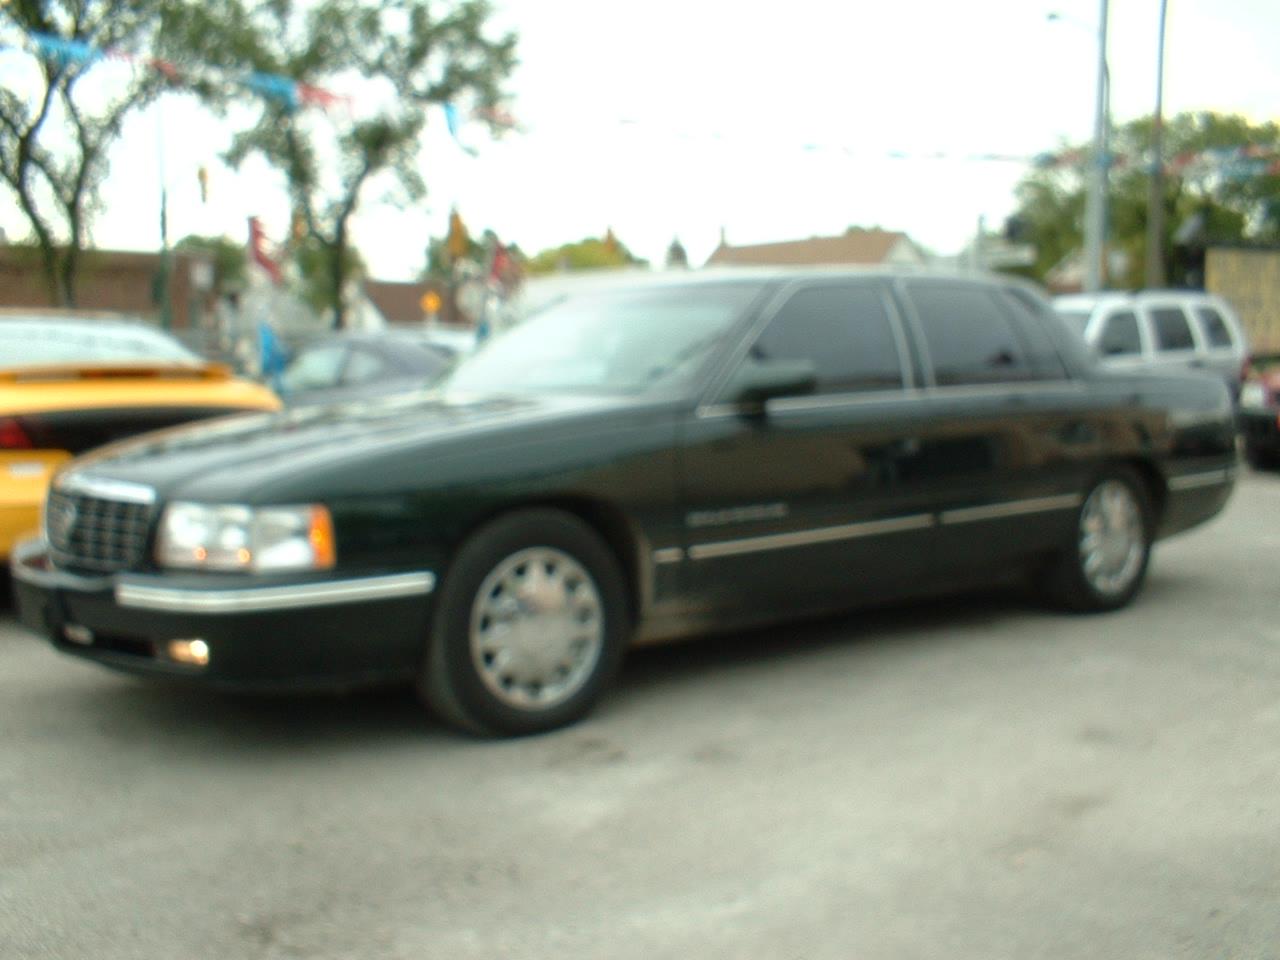 File 2004 Lincoln LS   NHTSA further Cadillac eldorado 1995 schwarz 3 furthermore Used Cadillac Allante as well Watch as well Watch. on cadillac eldorado problems